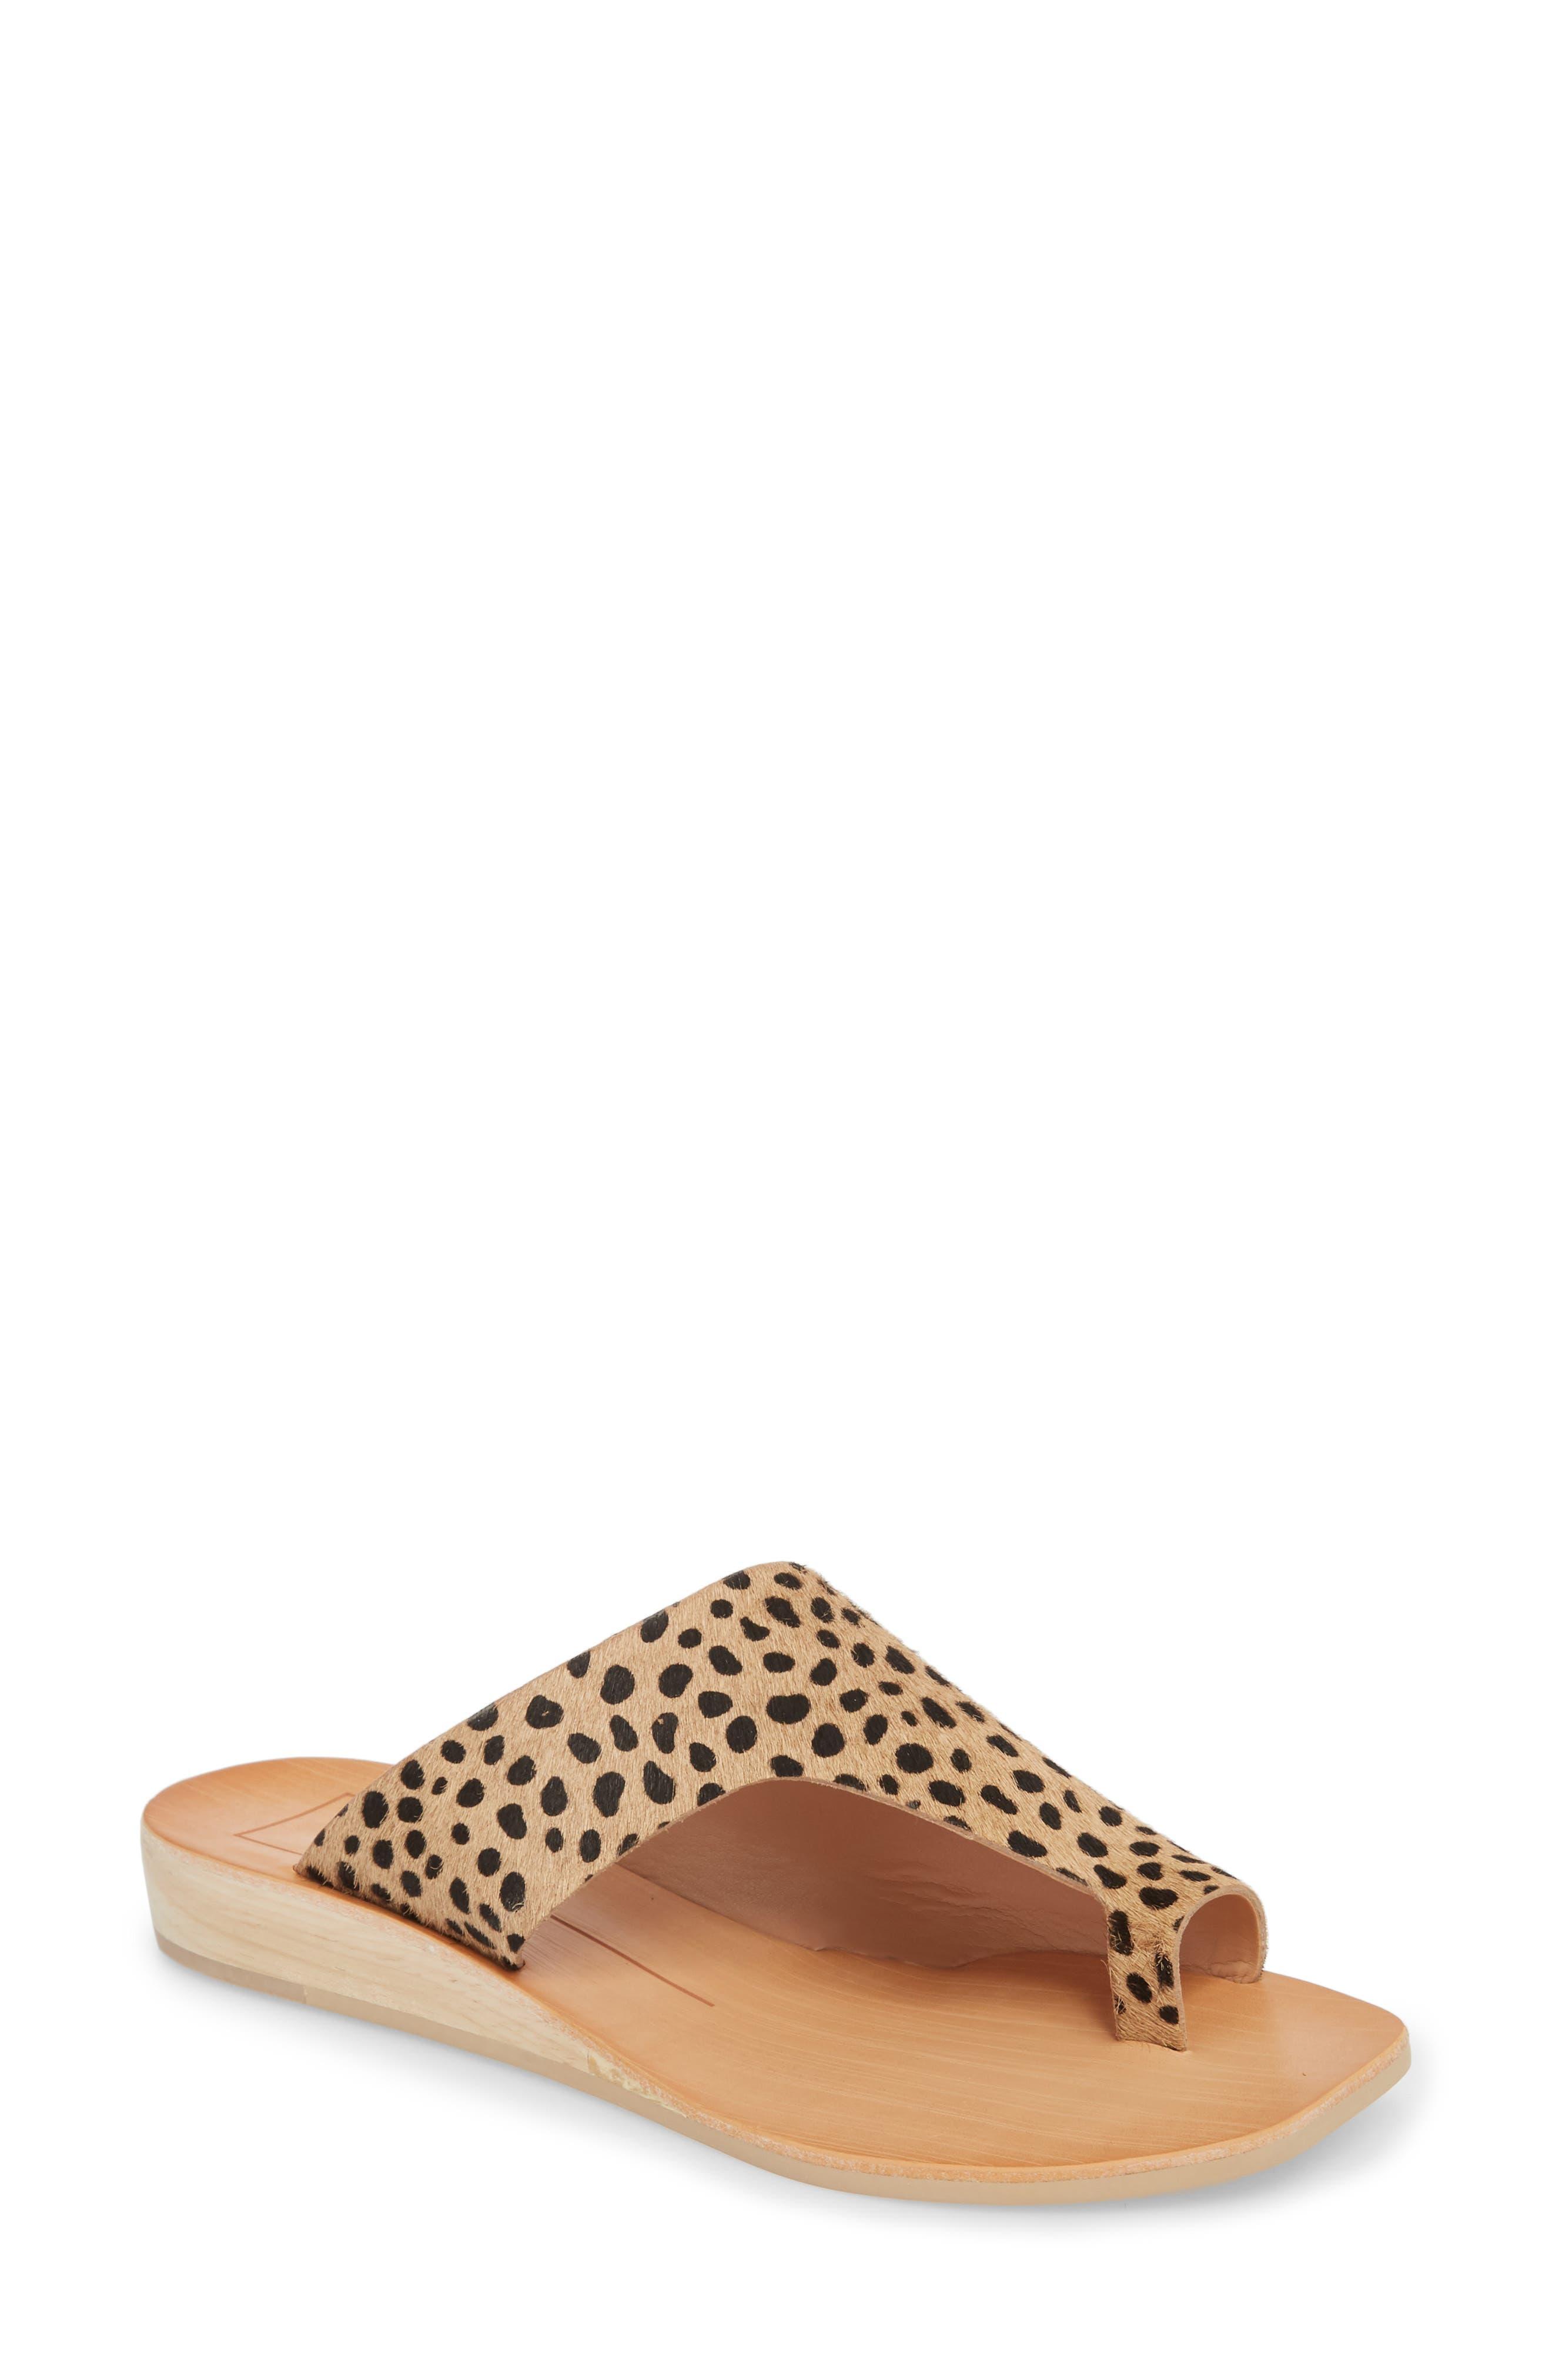 Hazle Genuine Calf Hair Sandal,                         Main,                         color, Leopard